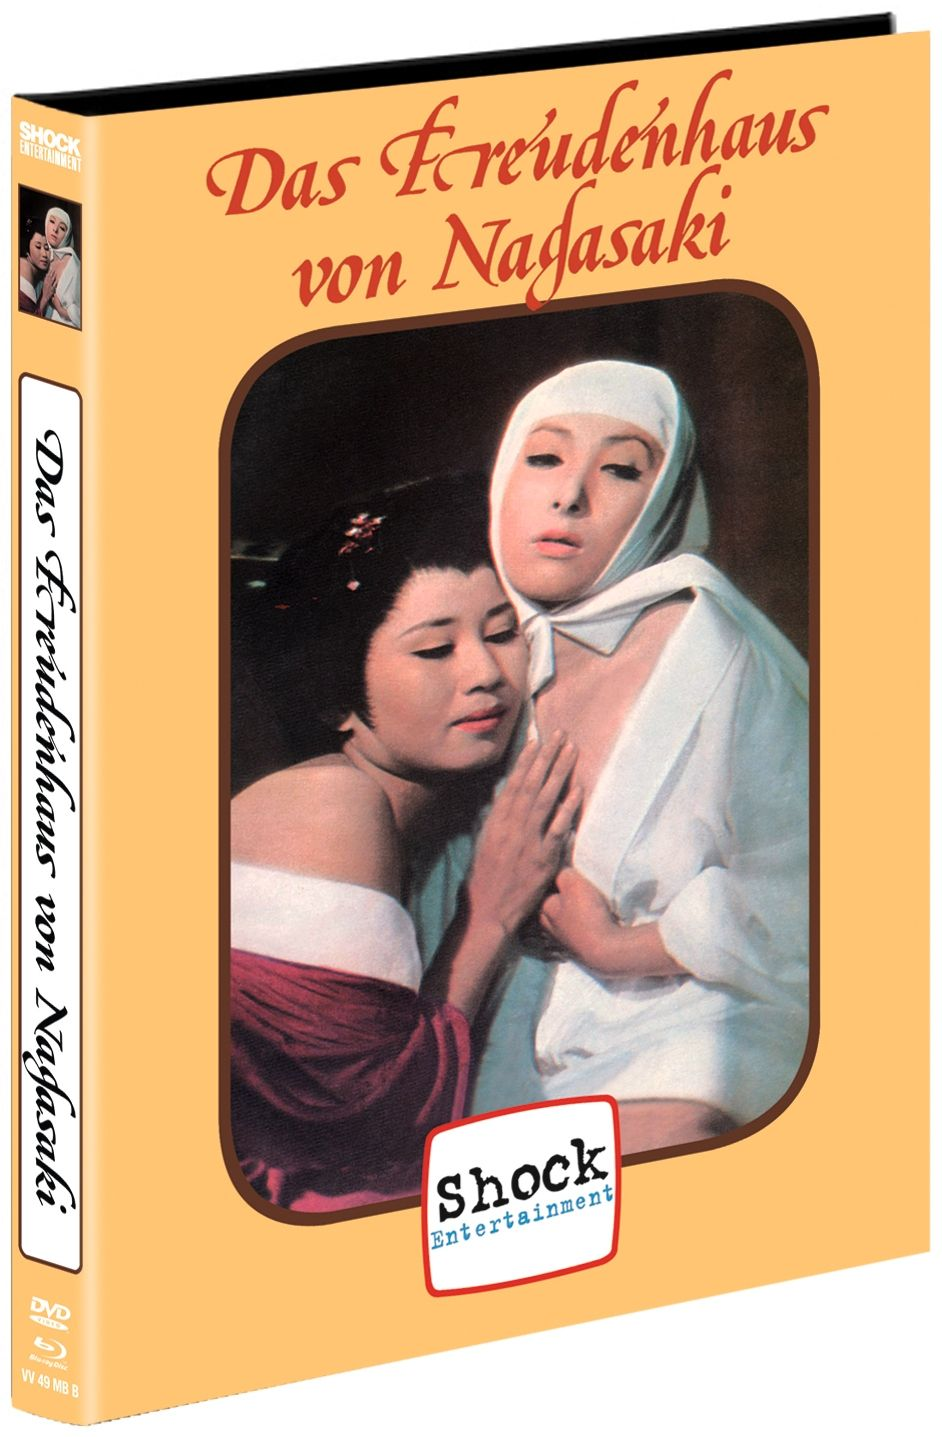 Freudenhaus von Nagasaki, Das (Lim. Uncut Mediabook - Cover B) (DVD + BLURAY)